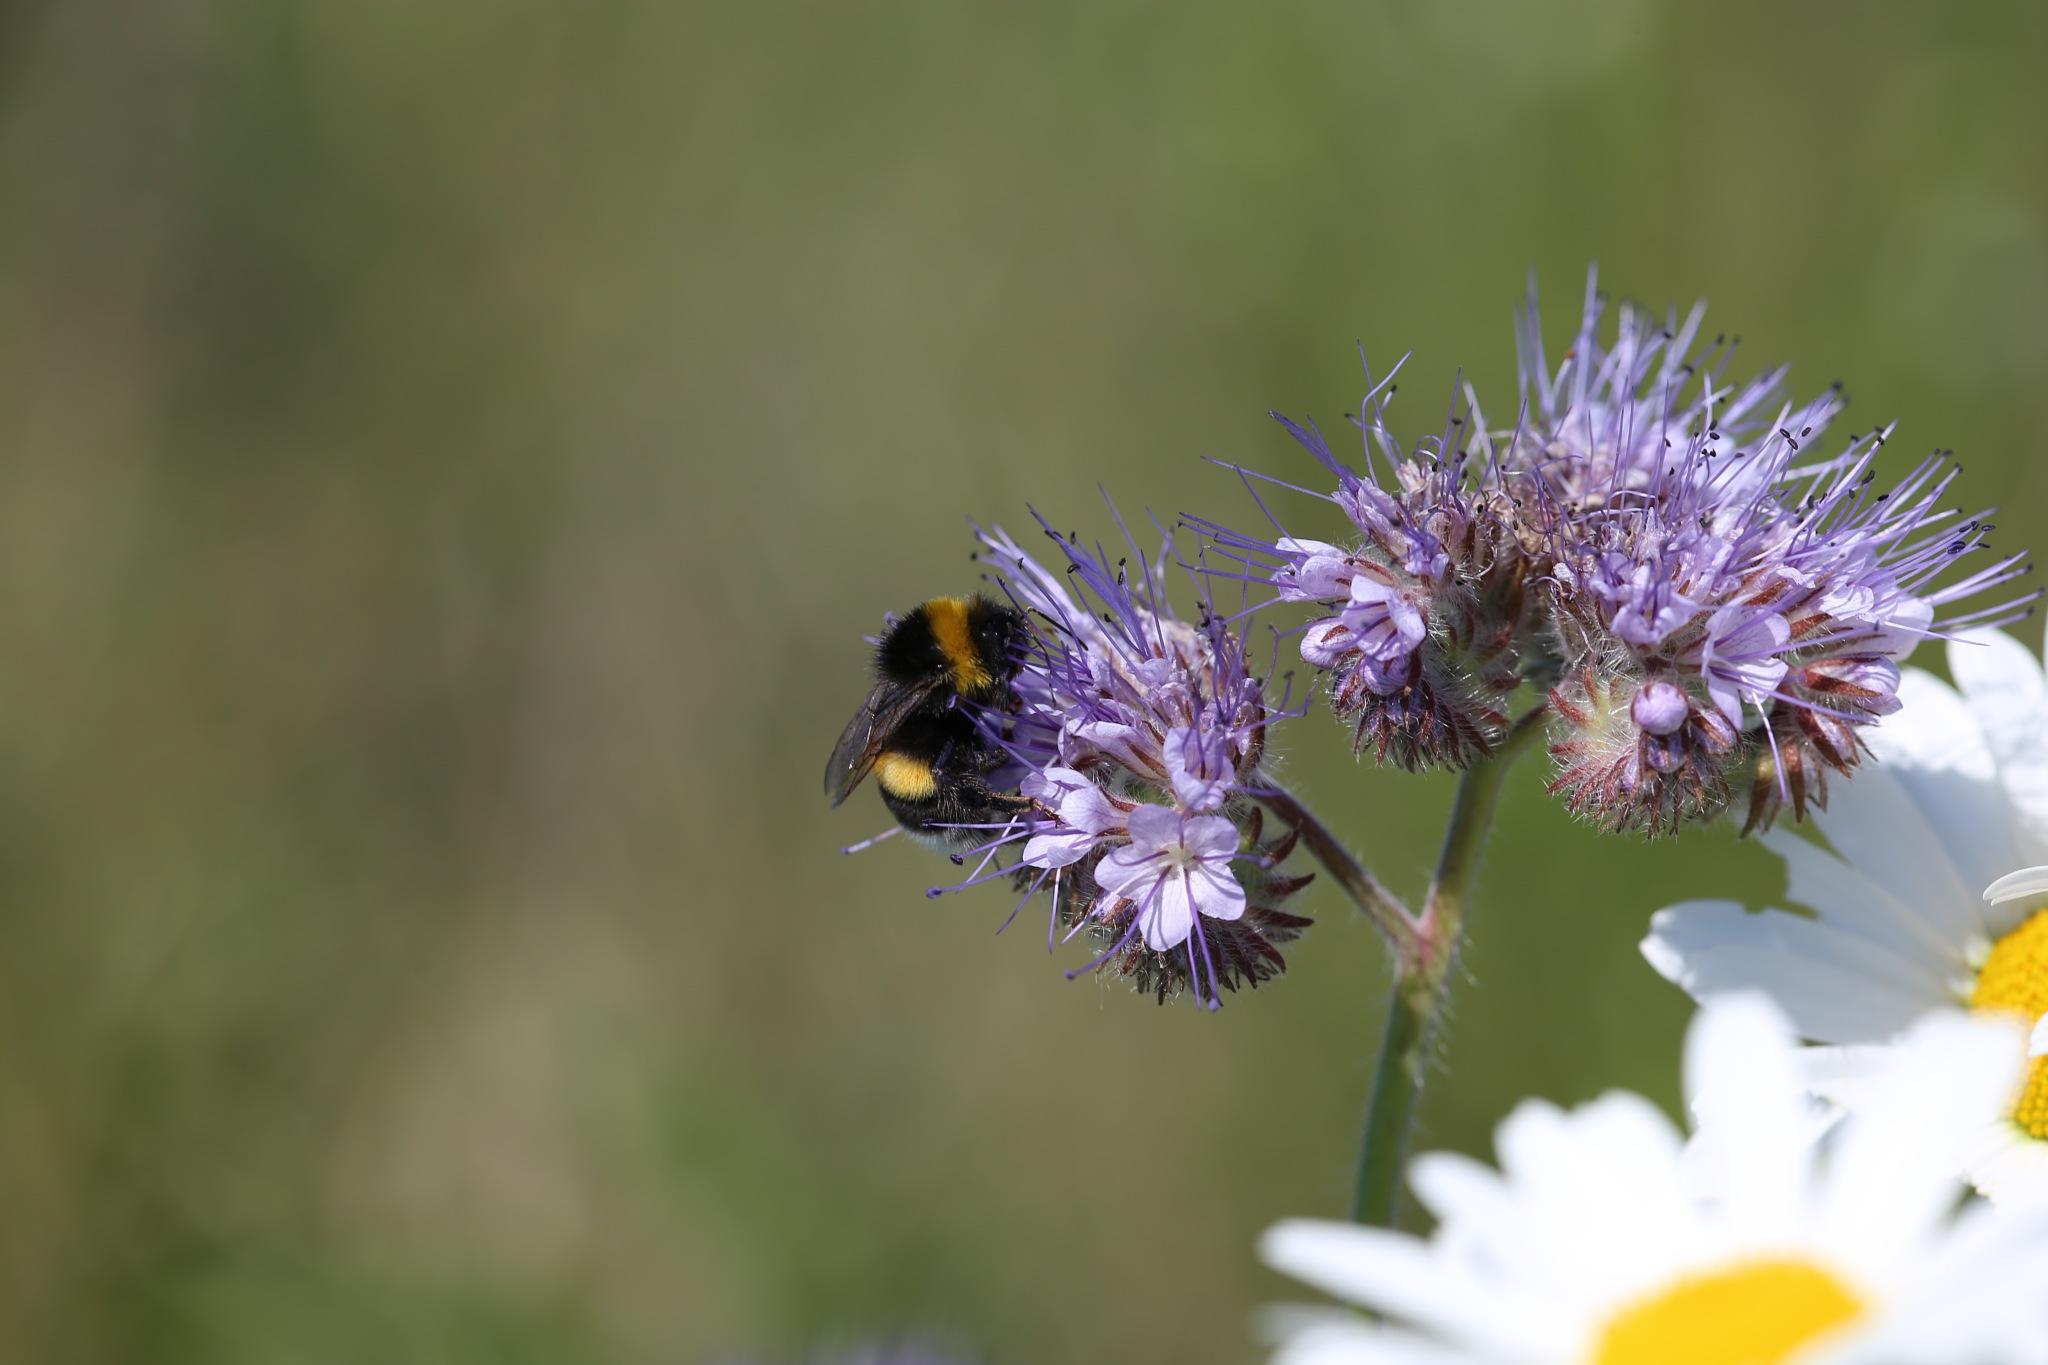 bee by viola visbeen